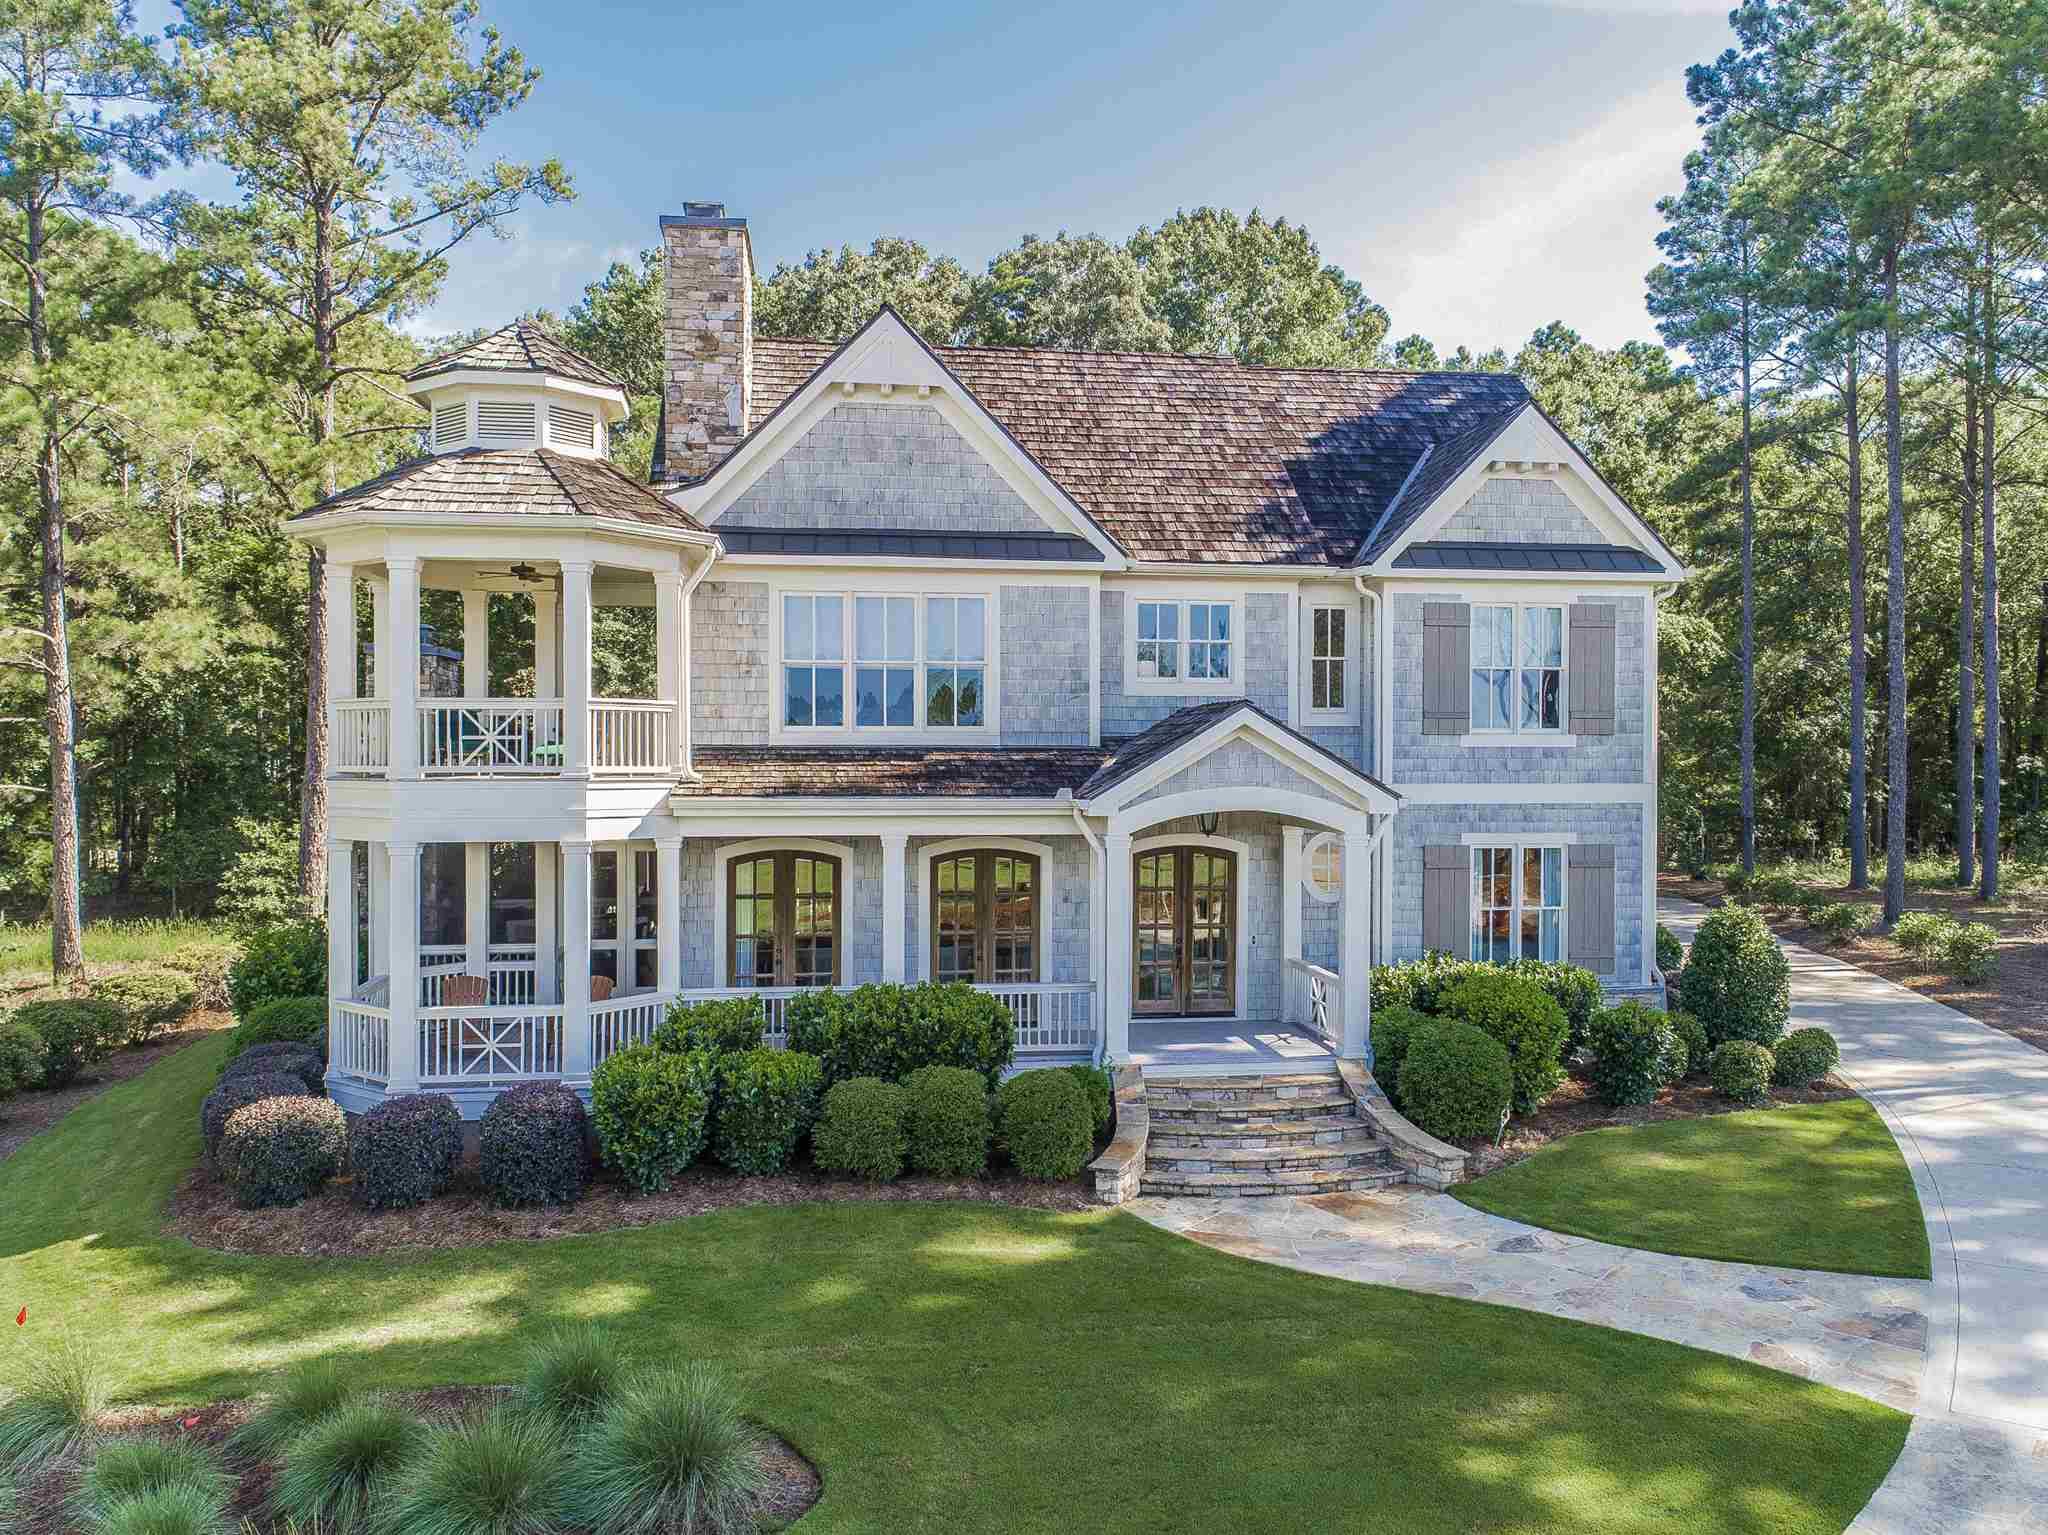 109 HAWKS RIDGE, Cuscowilla, Georgia 5 Bedroom as one of Homes & Land Real Estate